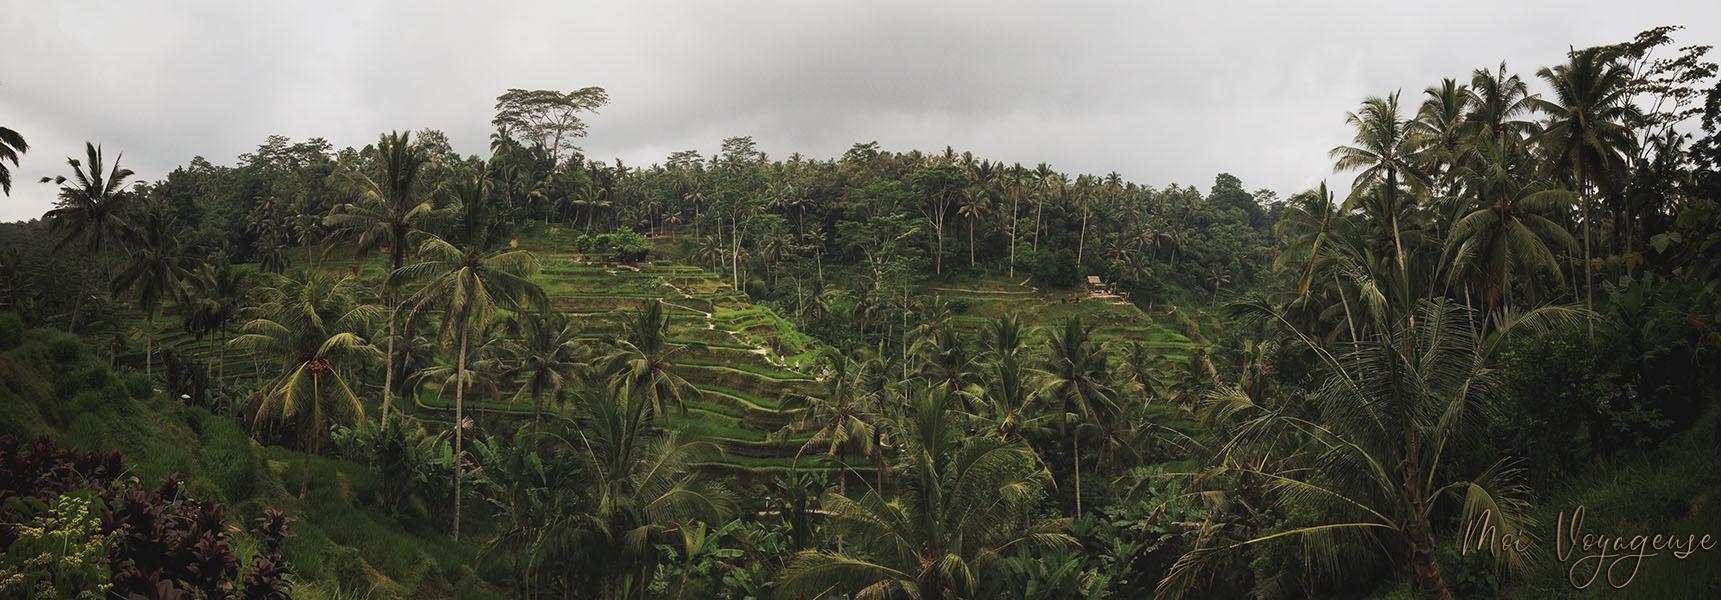 Rizières tegalalang bali udub indonésie